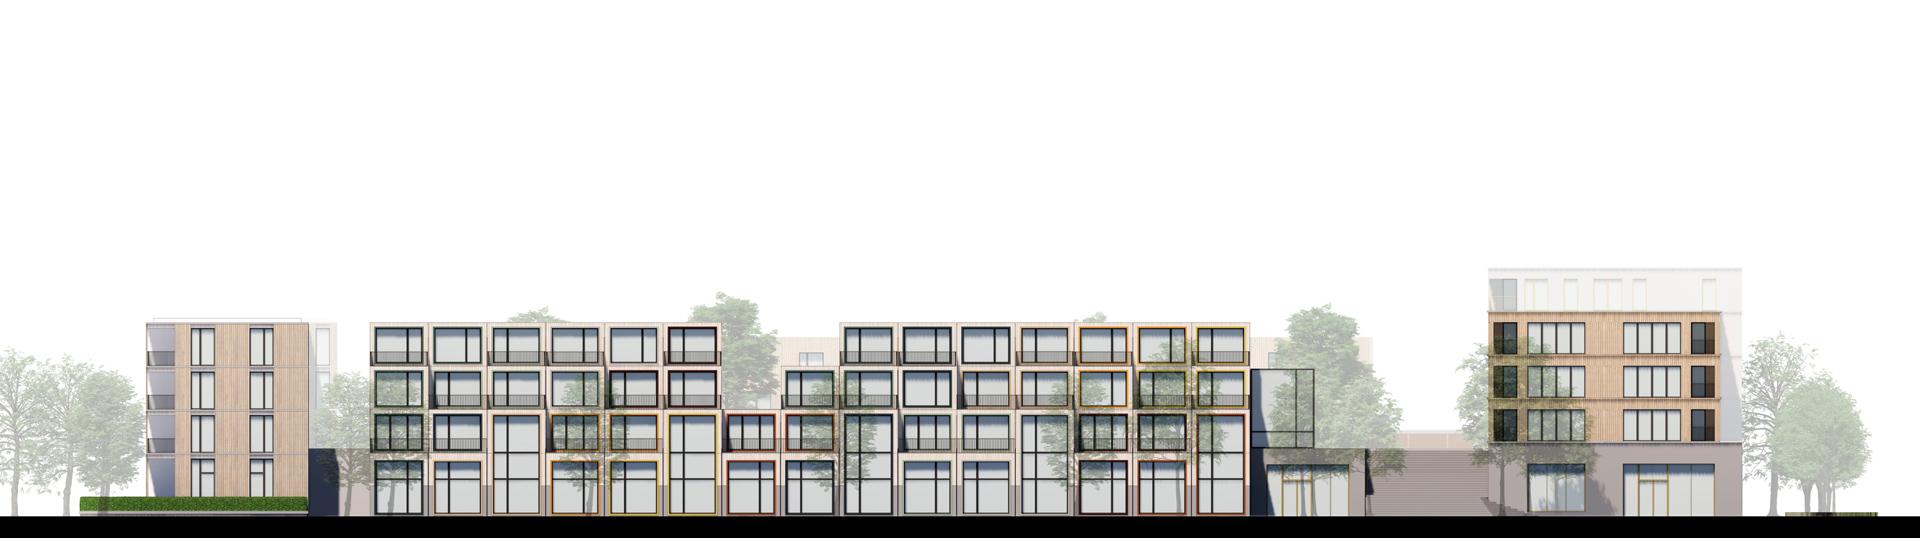 heart-ambacht-lagado-architects-gevel1-EP